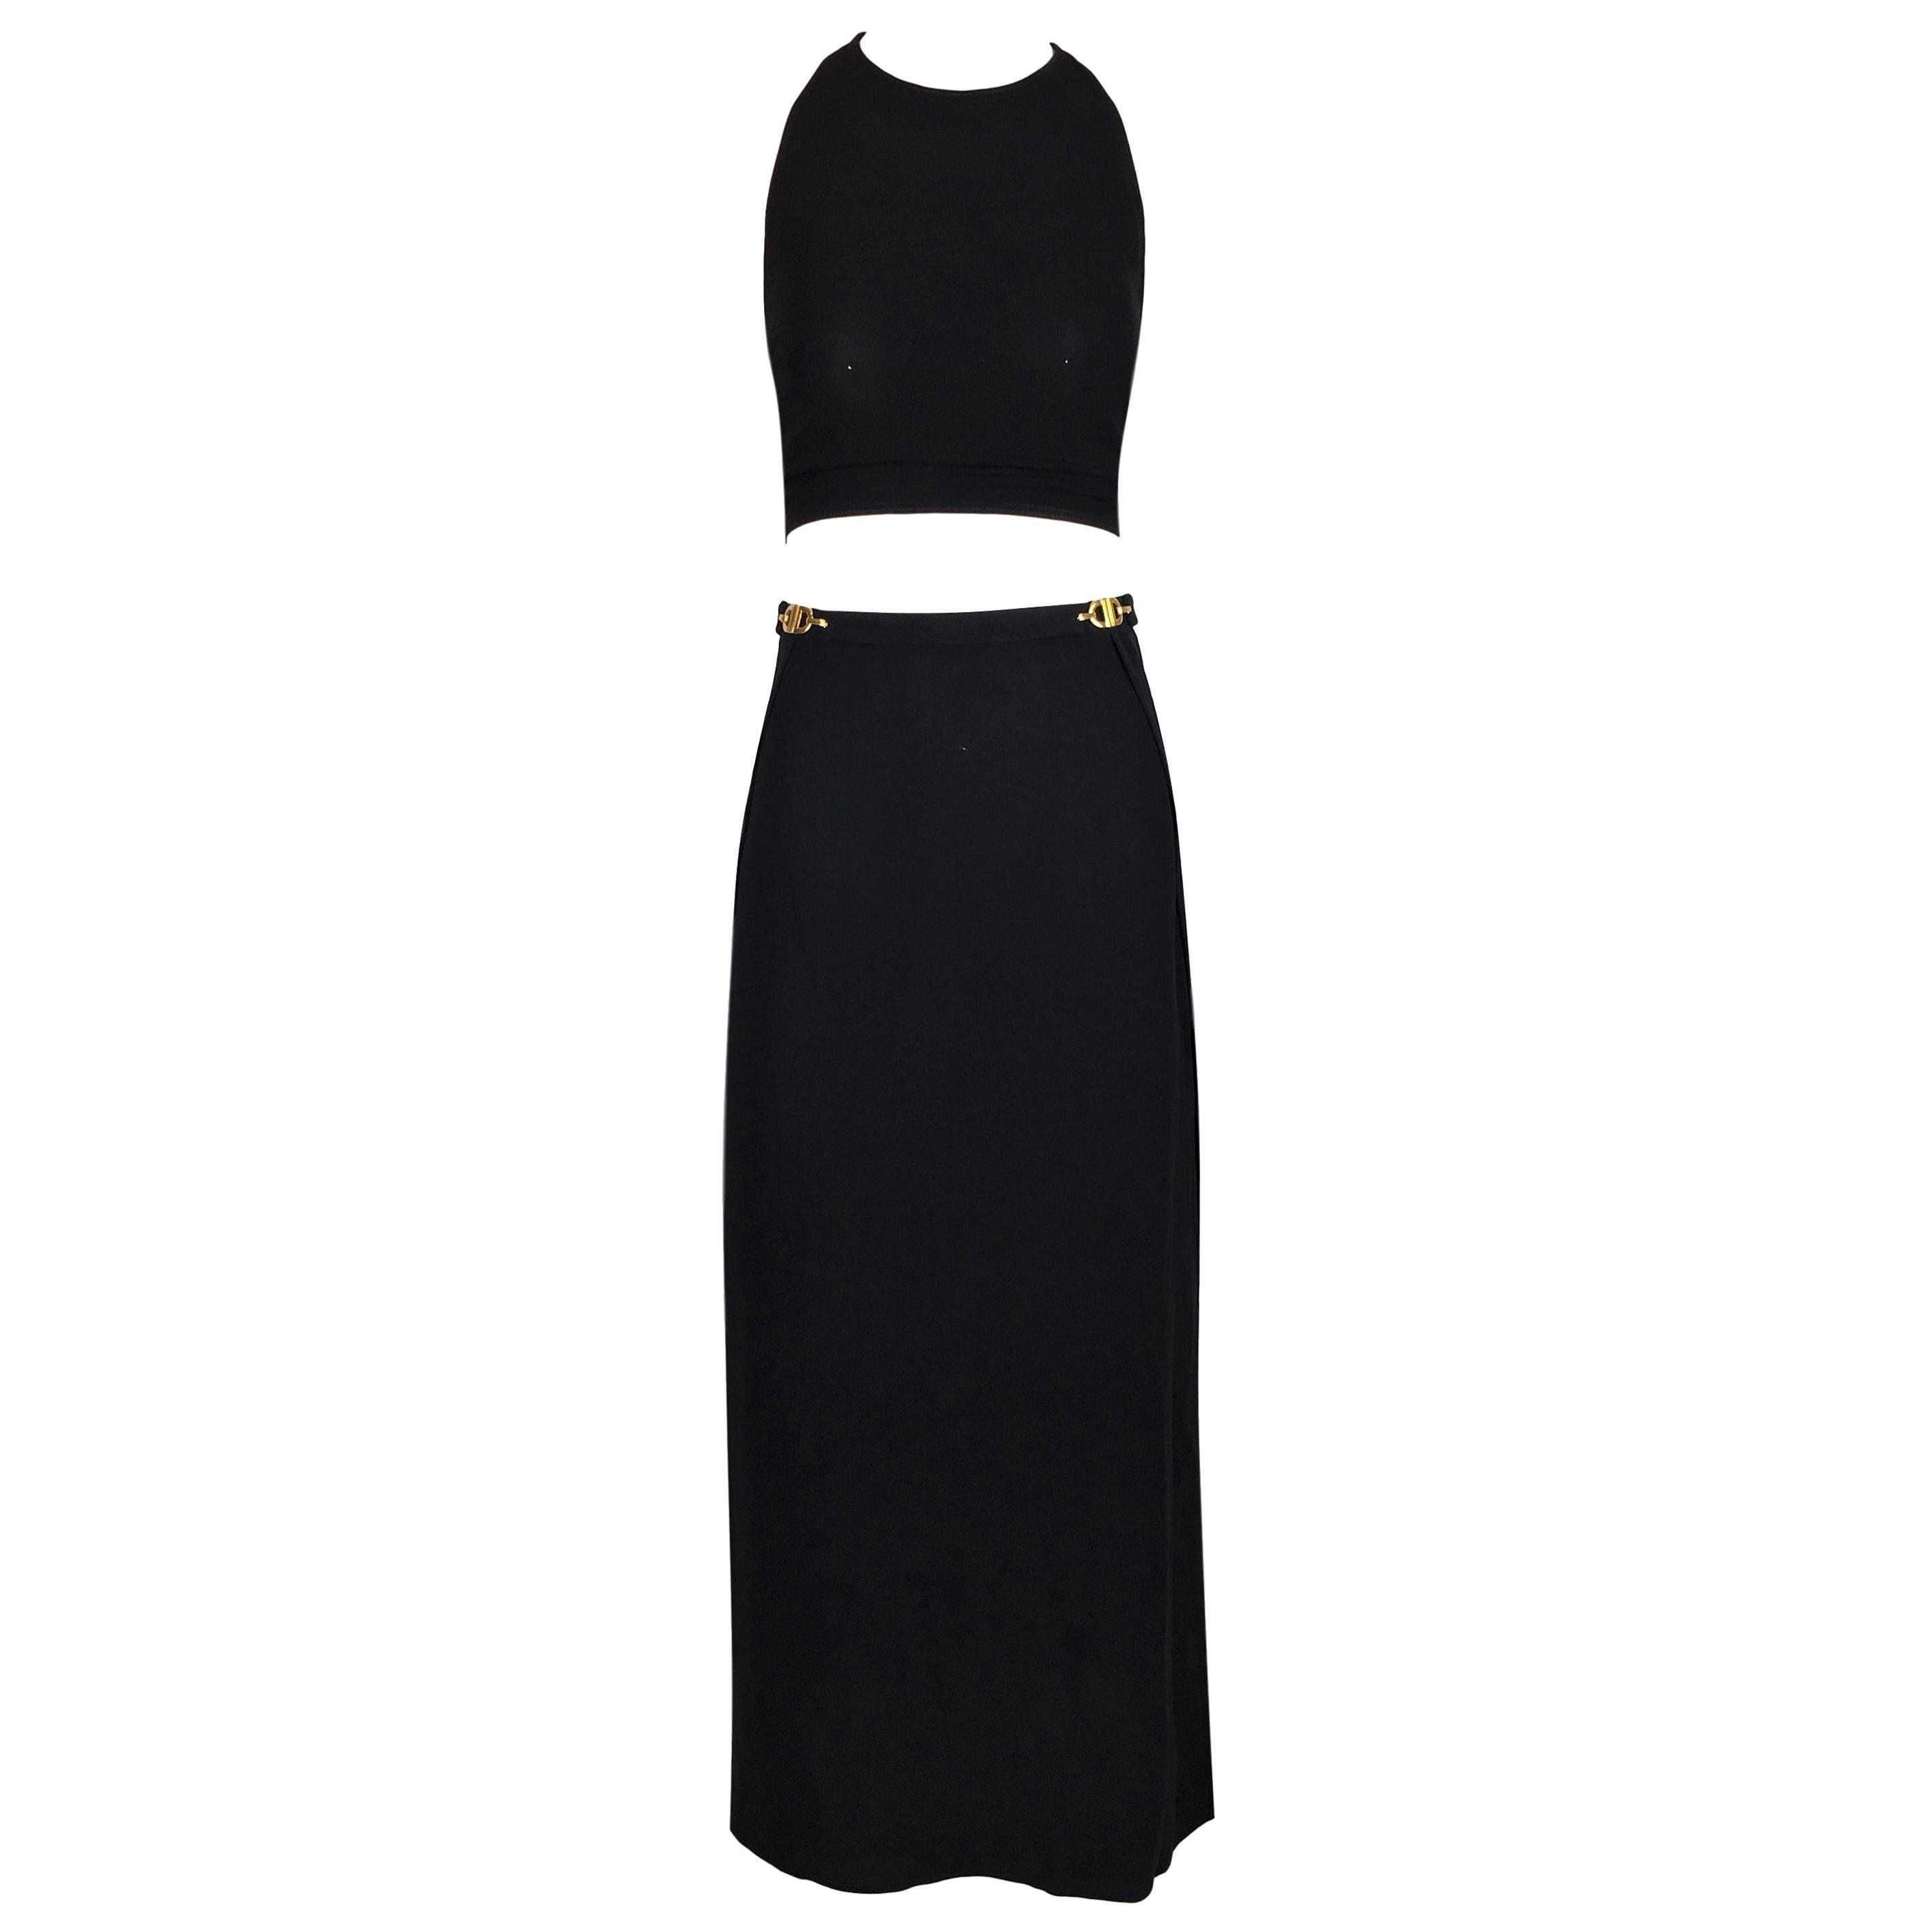 S/S 1997 Christian Dior Gianfranco Ferre Gold Buckles Black Crop Top & Skirt Set